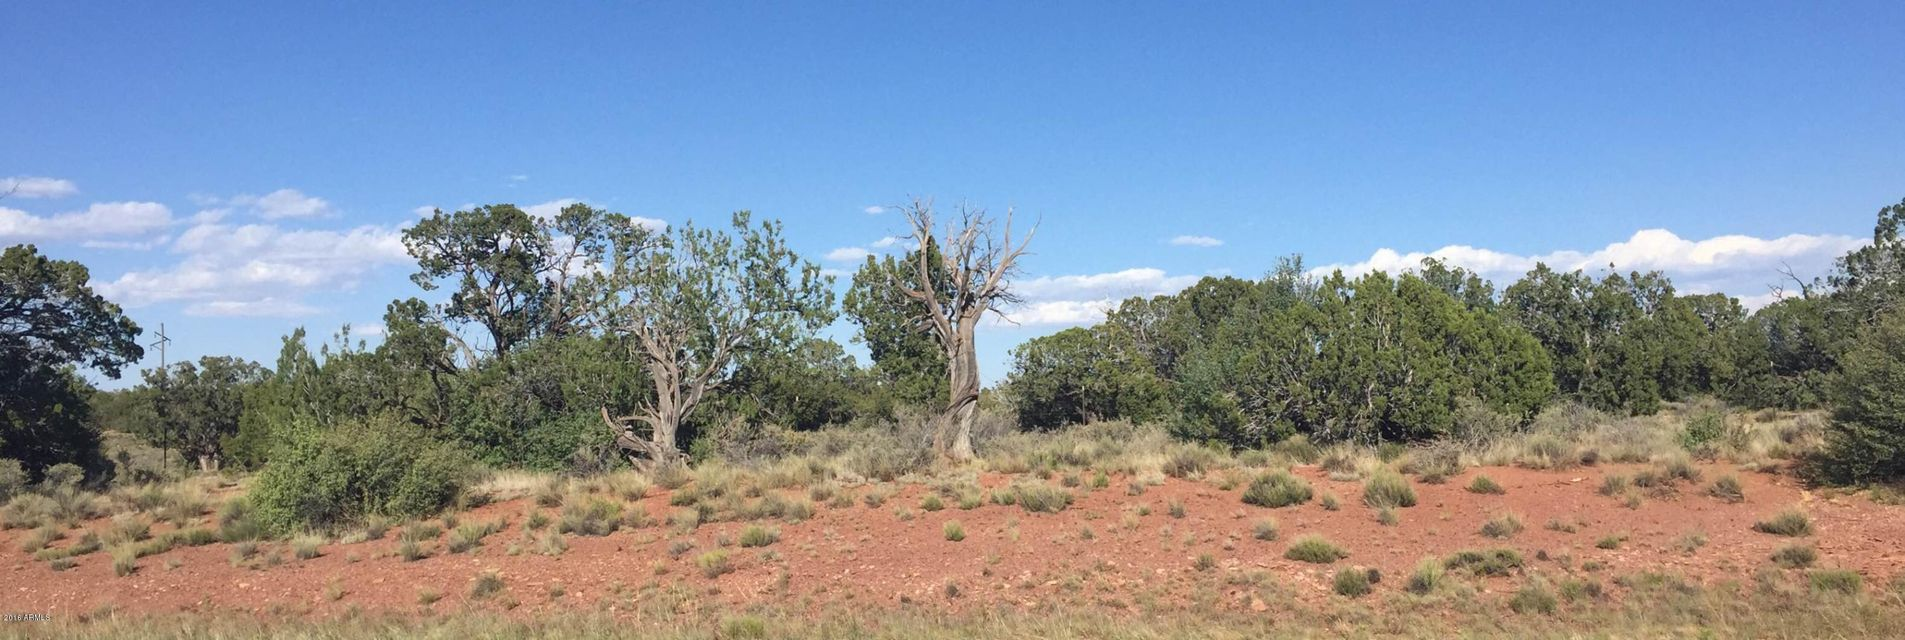 3657 W DEER FOREST Drive Lot 195, Williams, AZ 86046